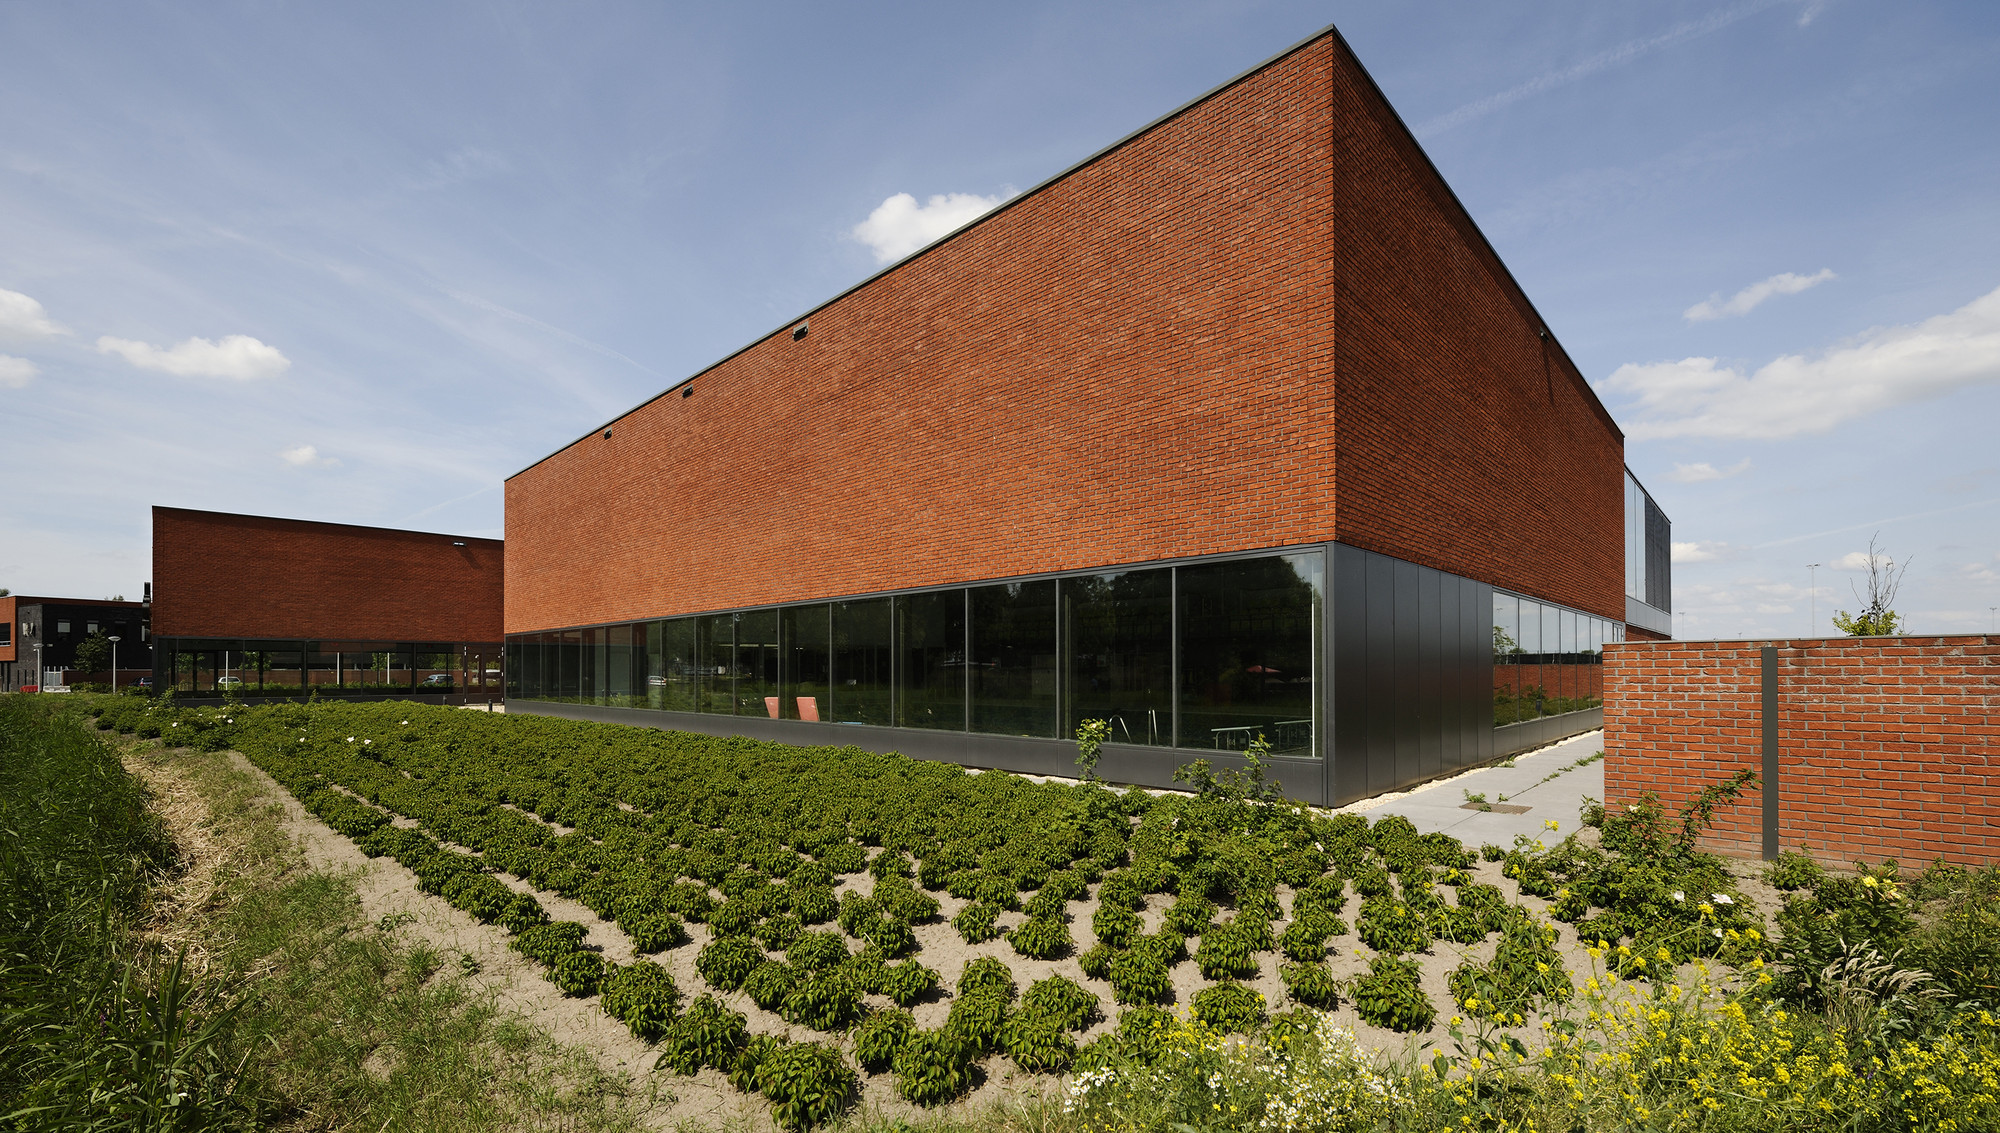 Piscina Fletiomare Utrecht / Slangen + Koenis Architects